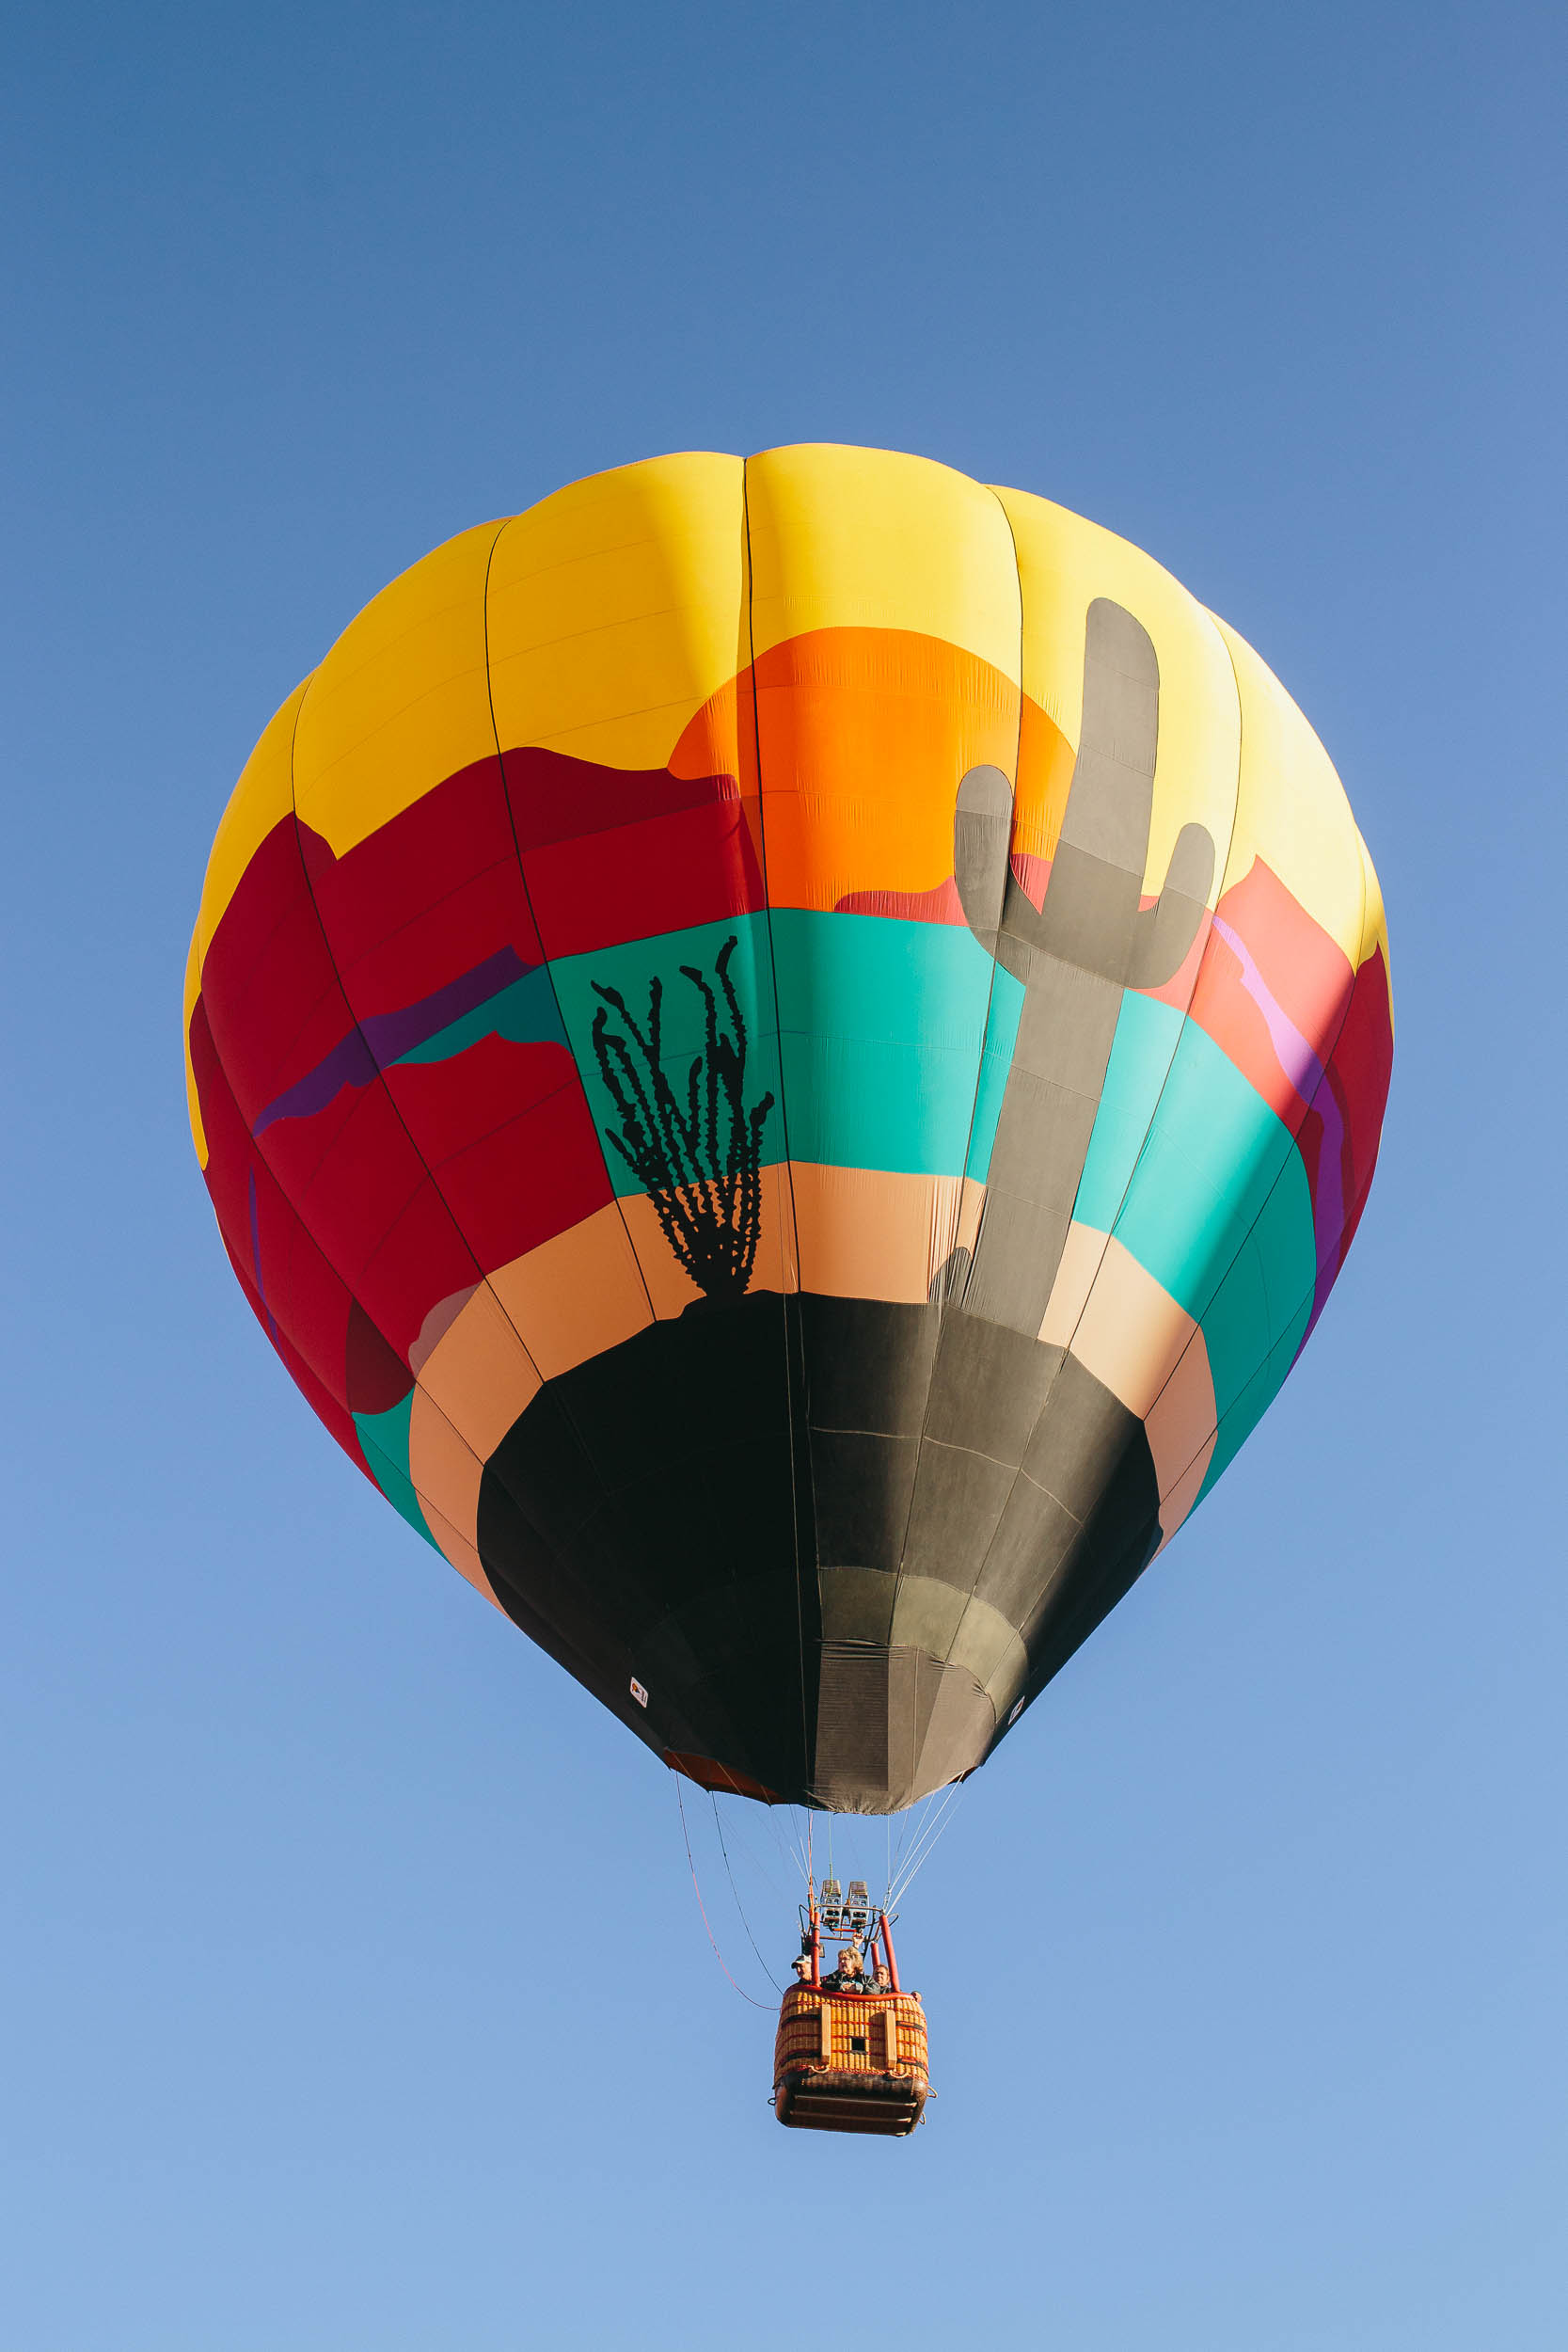 Kyle-Sheppard-Kanab-Balloon-Festival-24.jpg